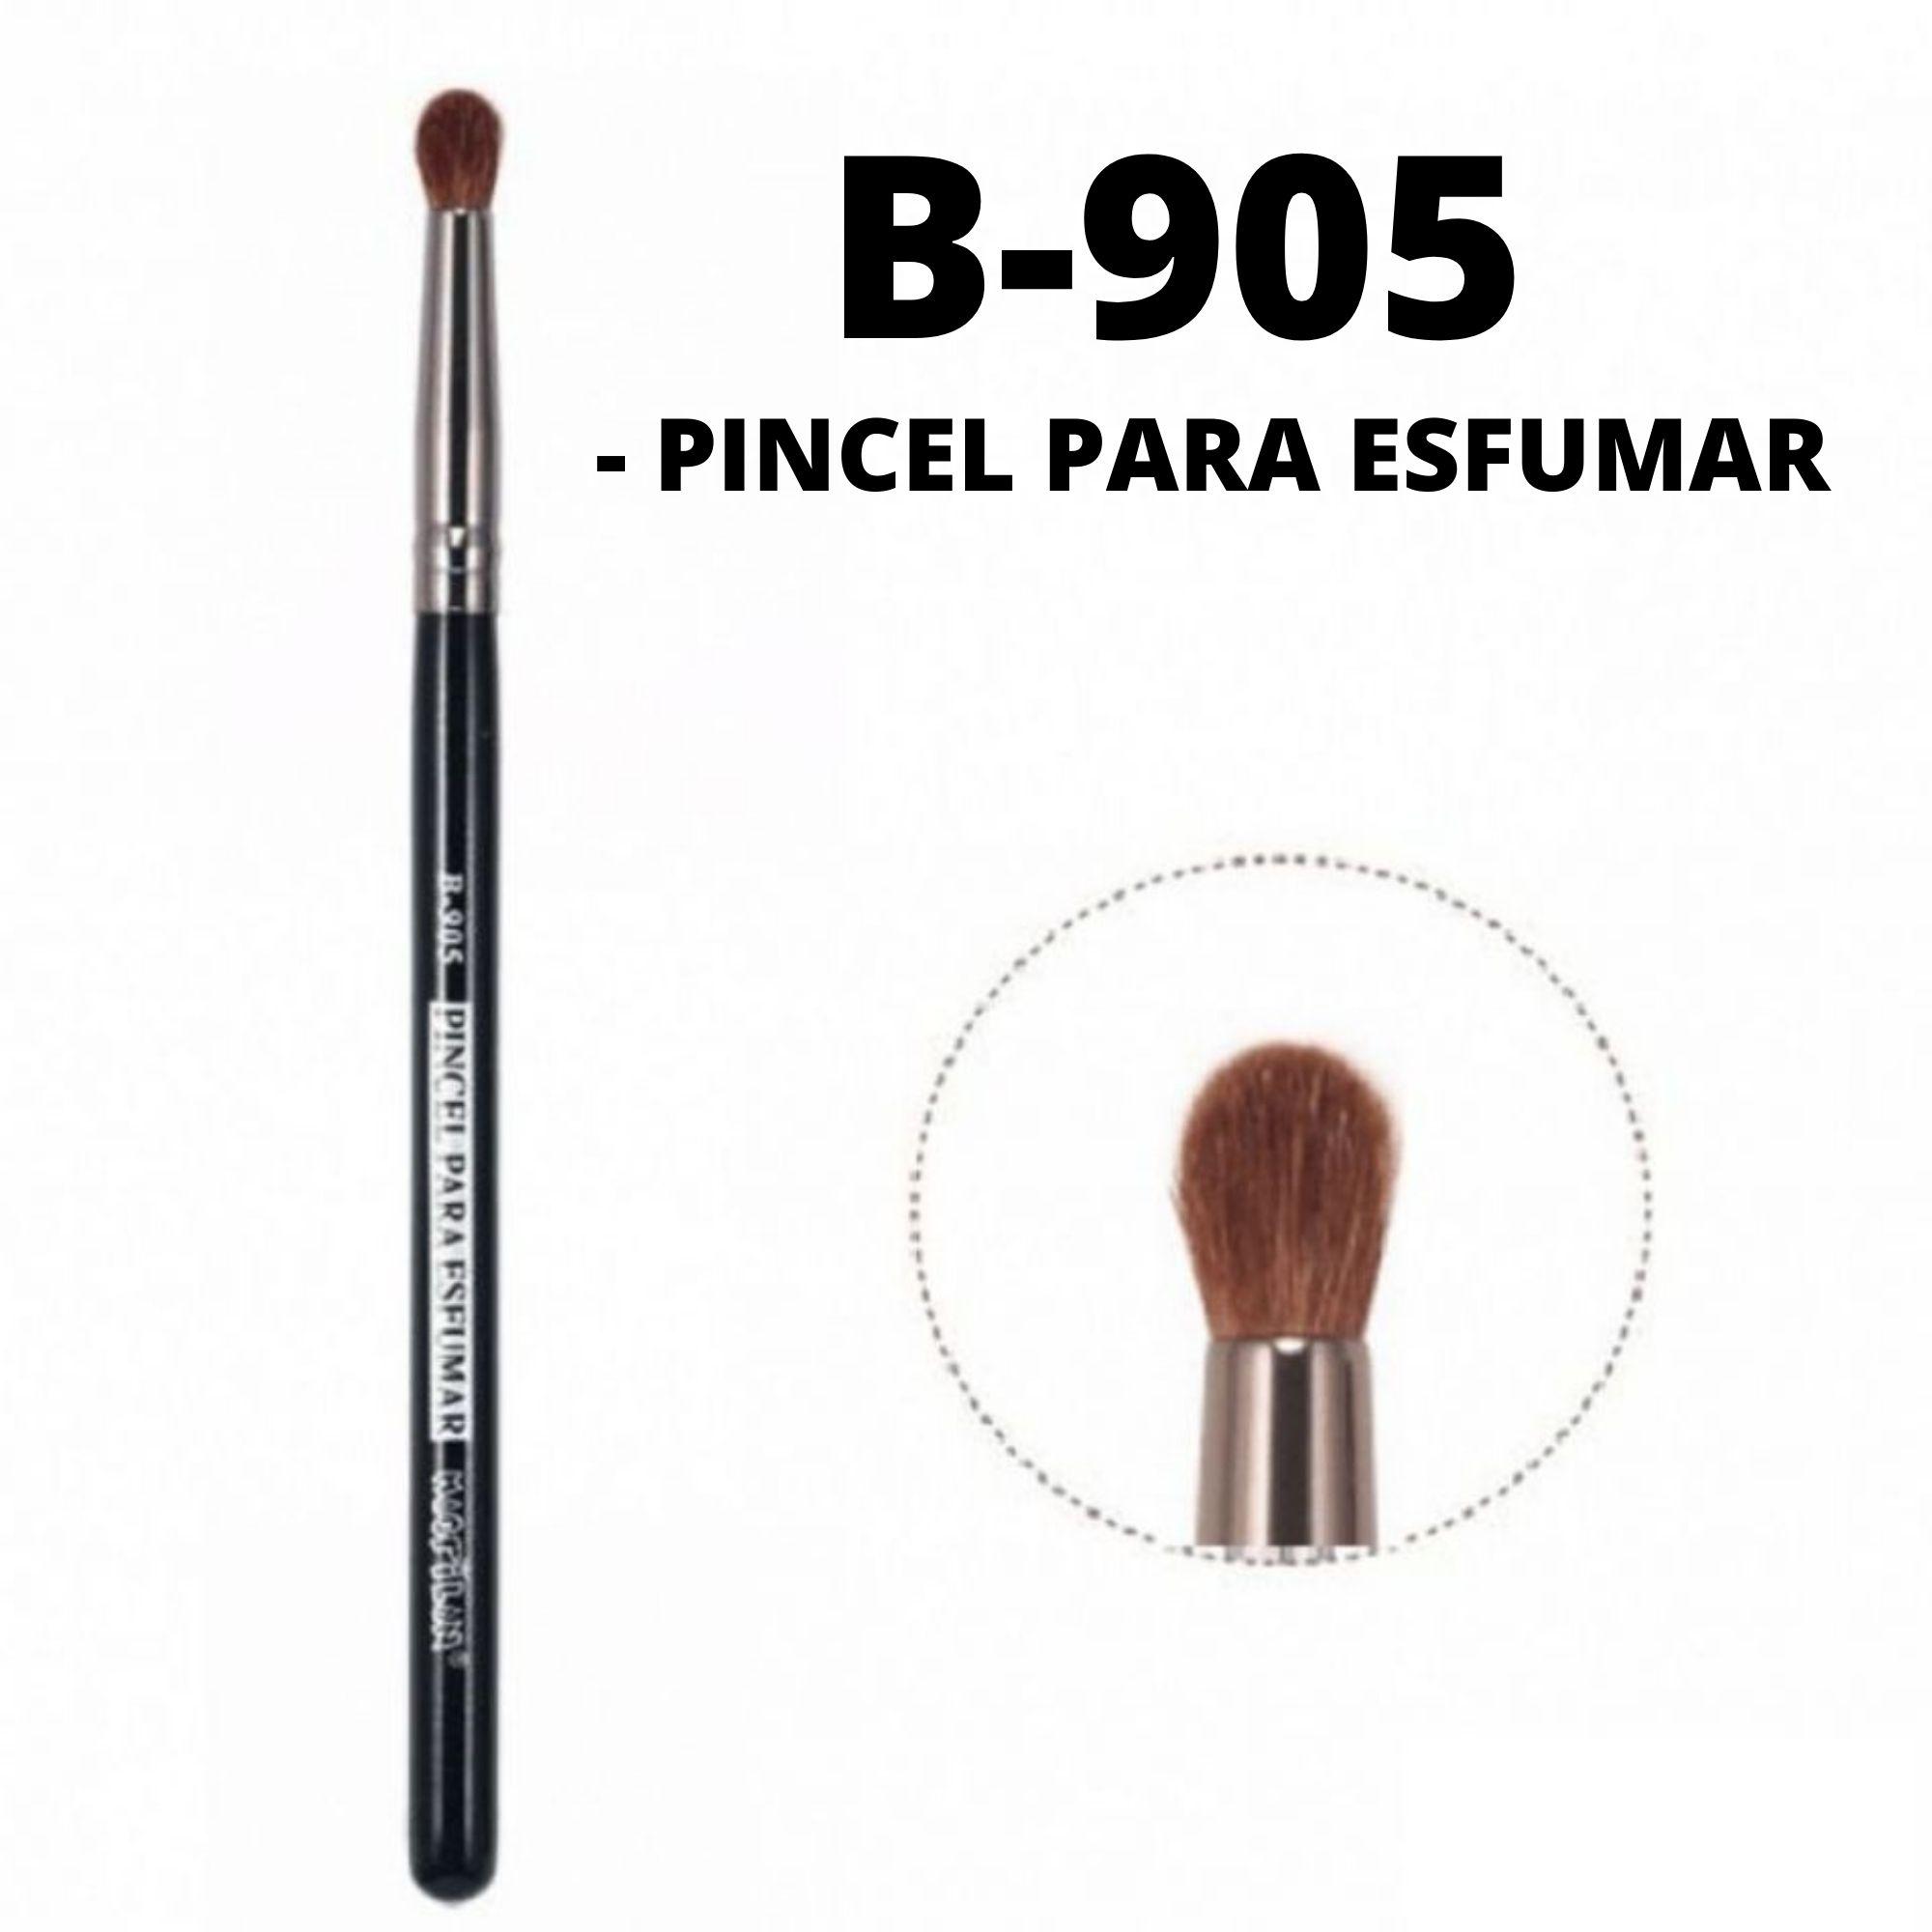 Pincel Para Esfumar B905 Linha Black Profissional Macrilan